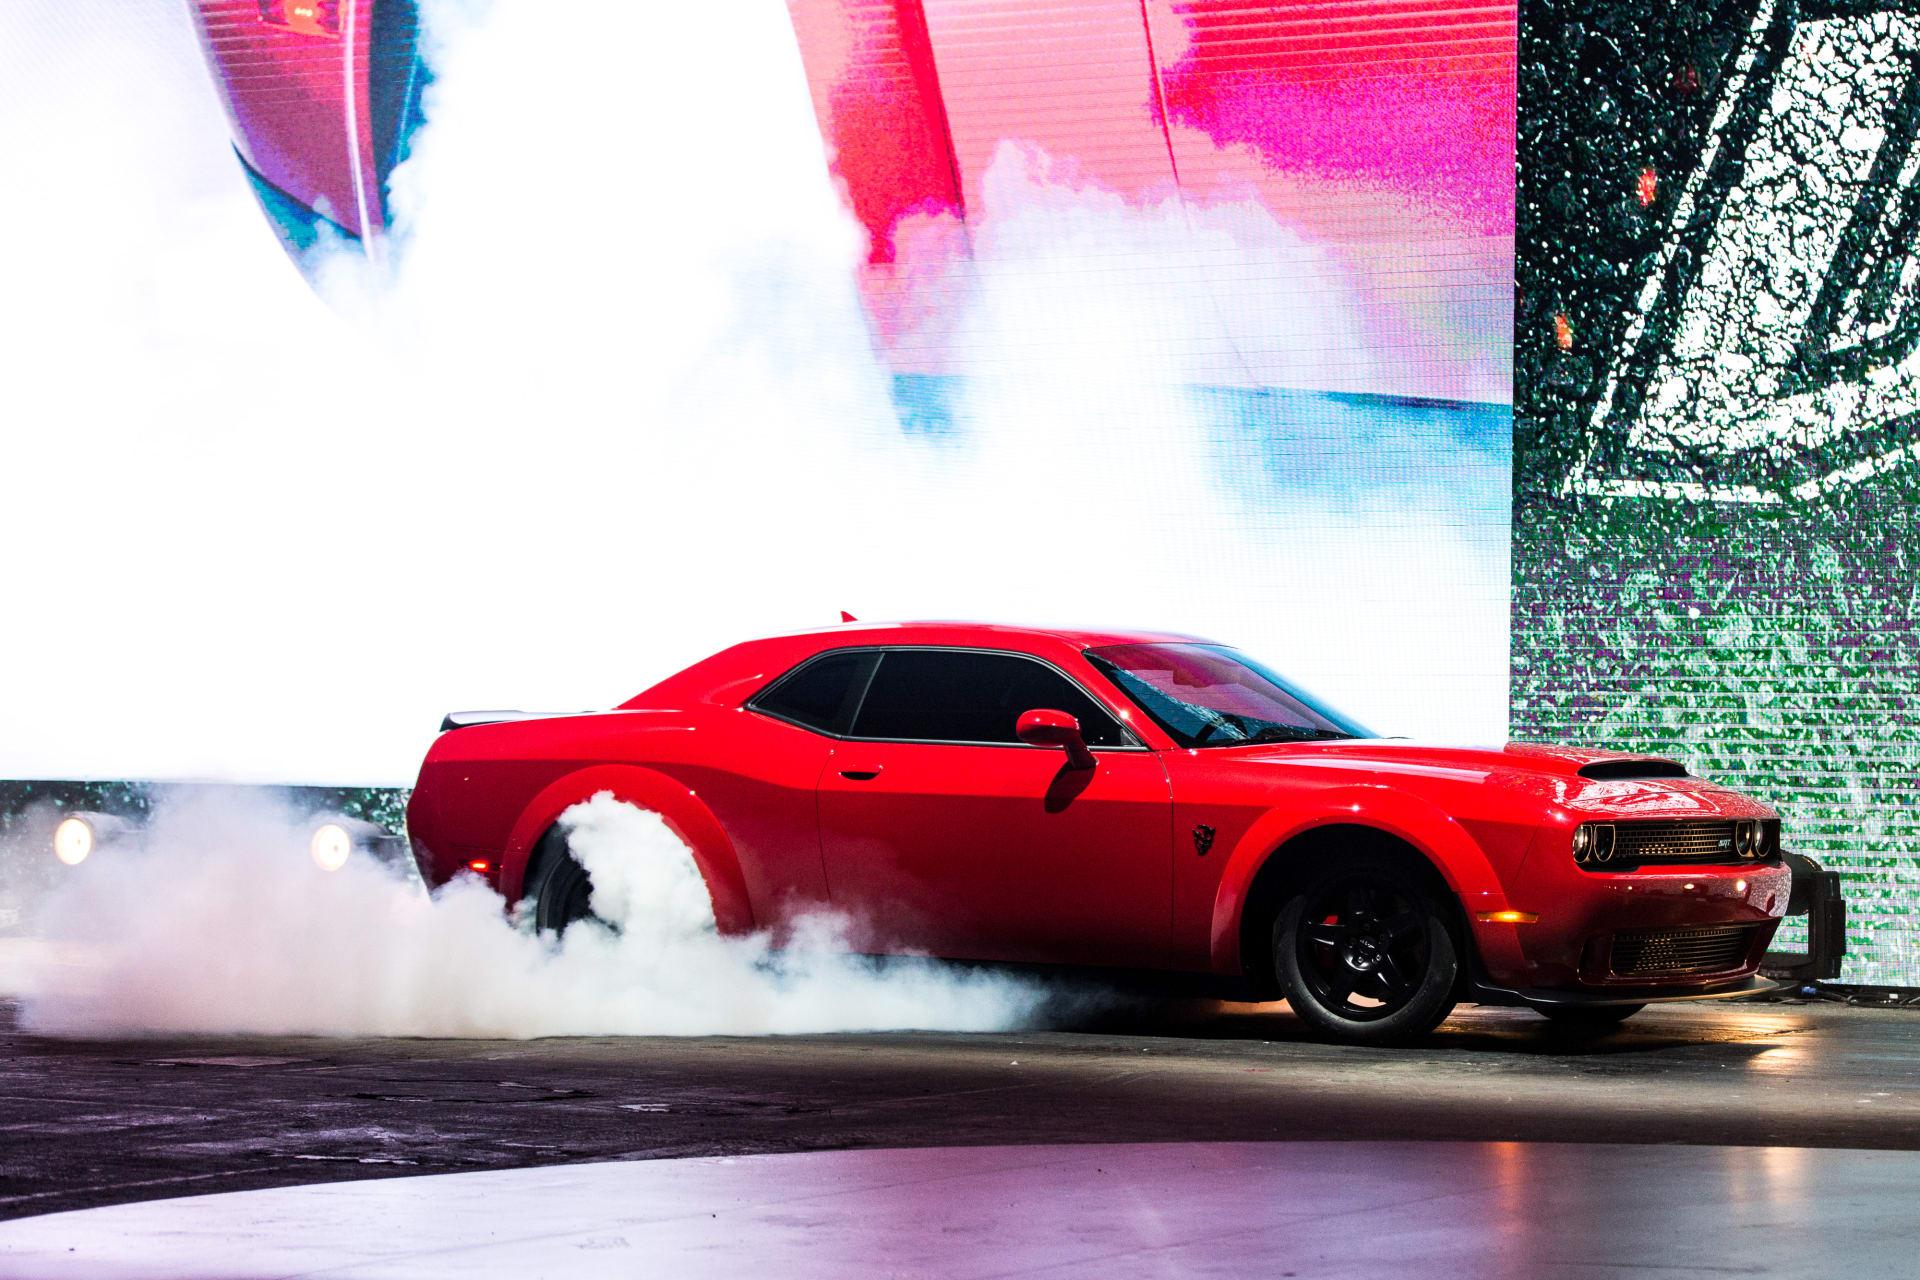 dodge hellcat demon burnout 2018 Dodge Challenger SRT Demon Review: First Impressions